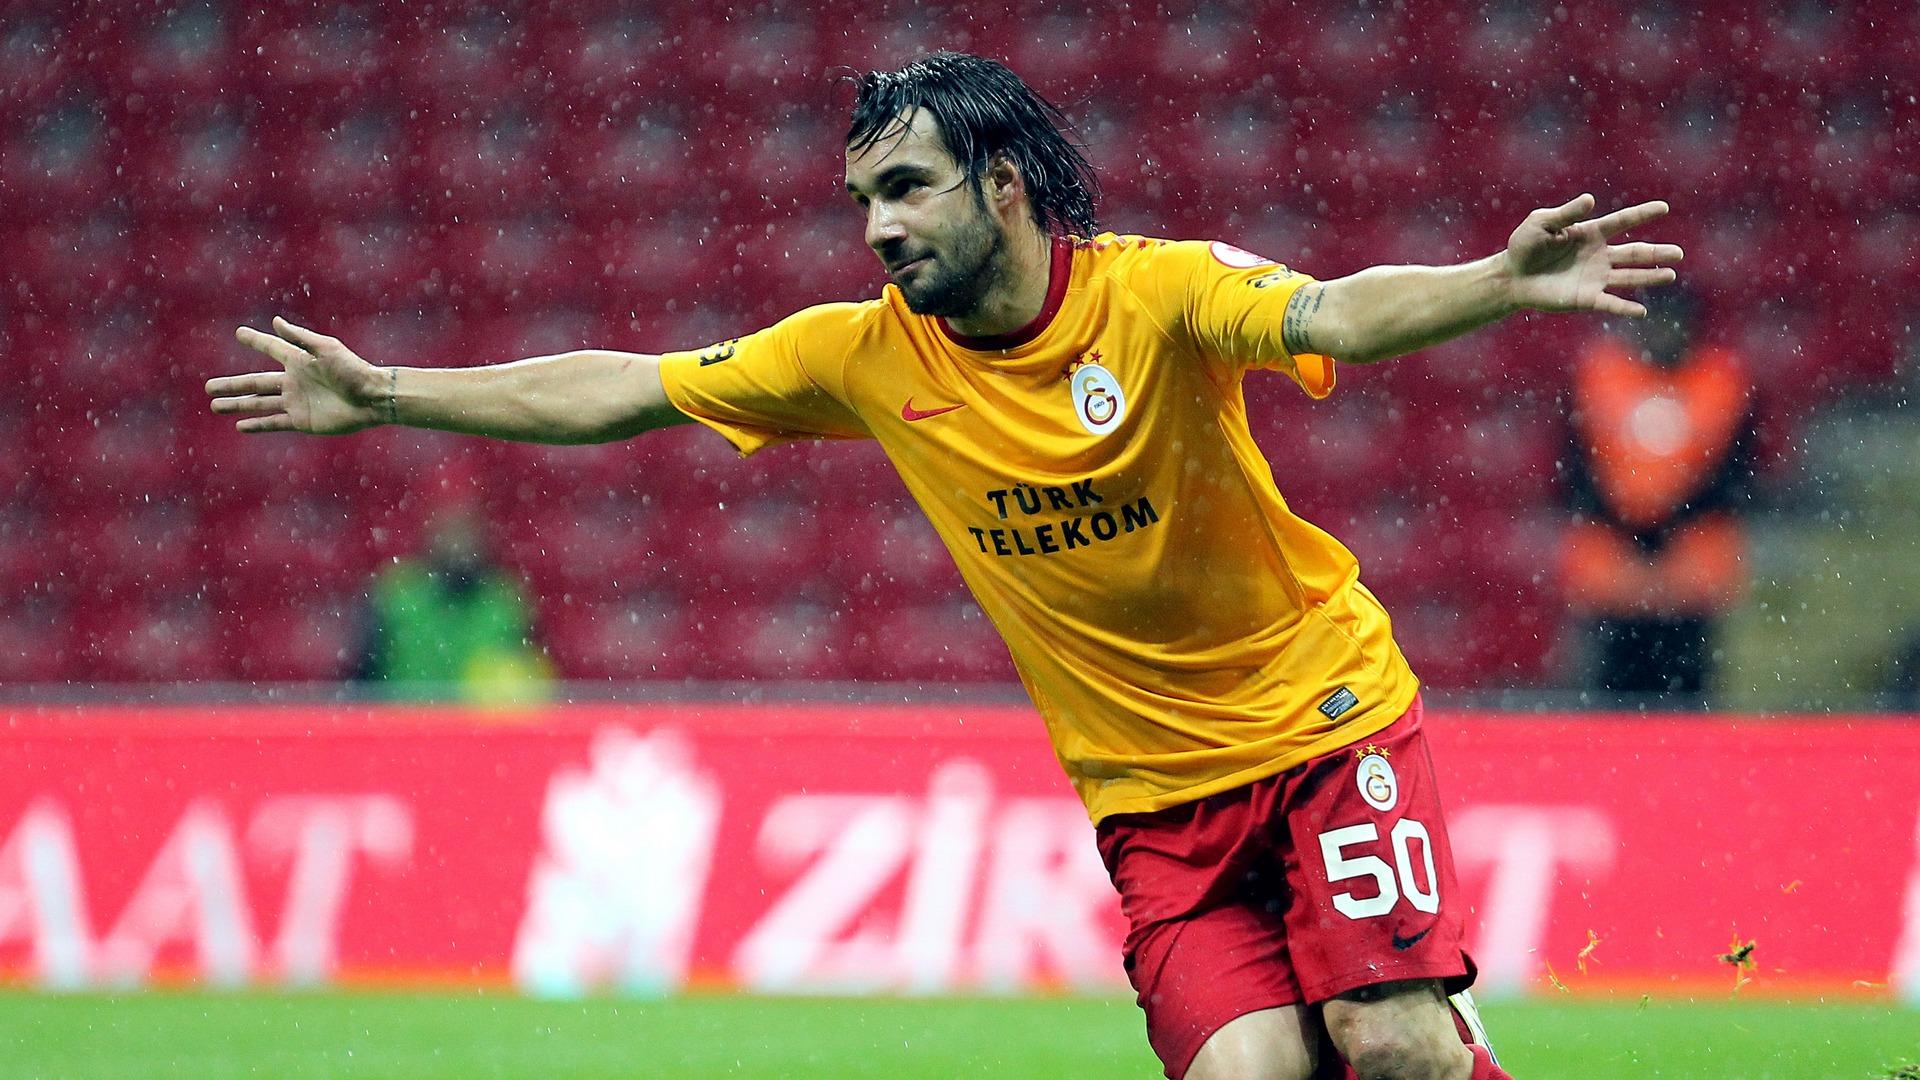 Engin Baytar Galatasaray 2012